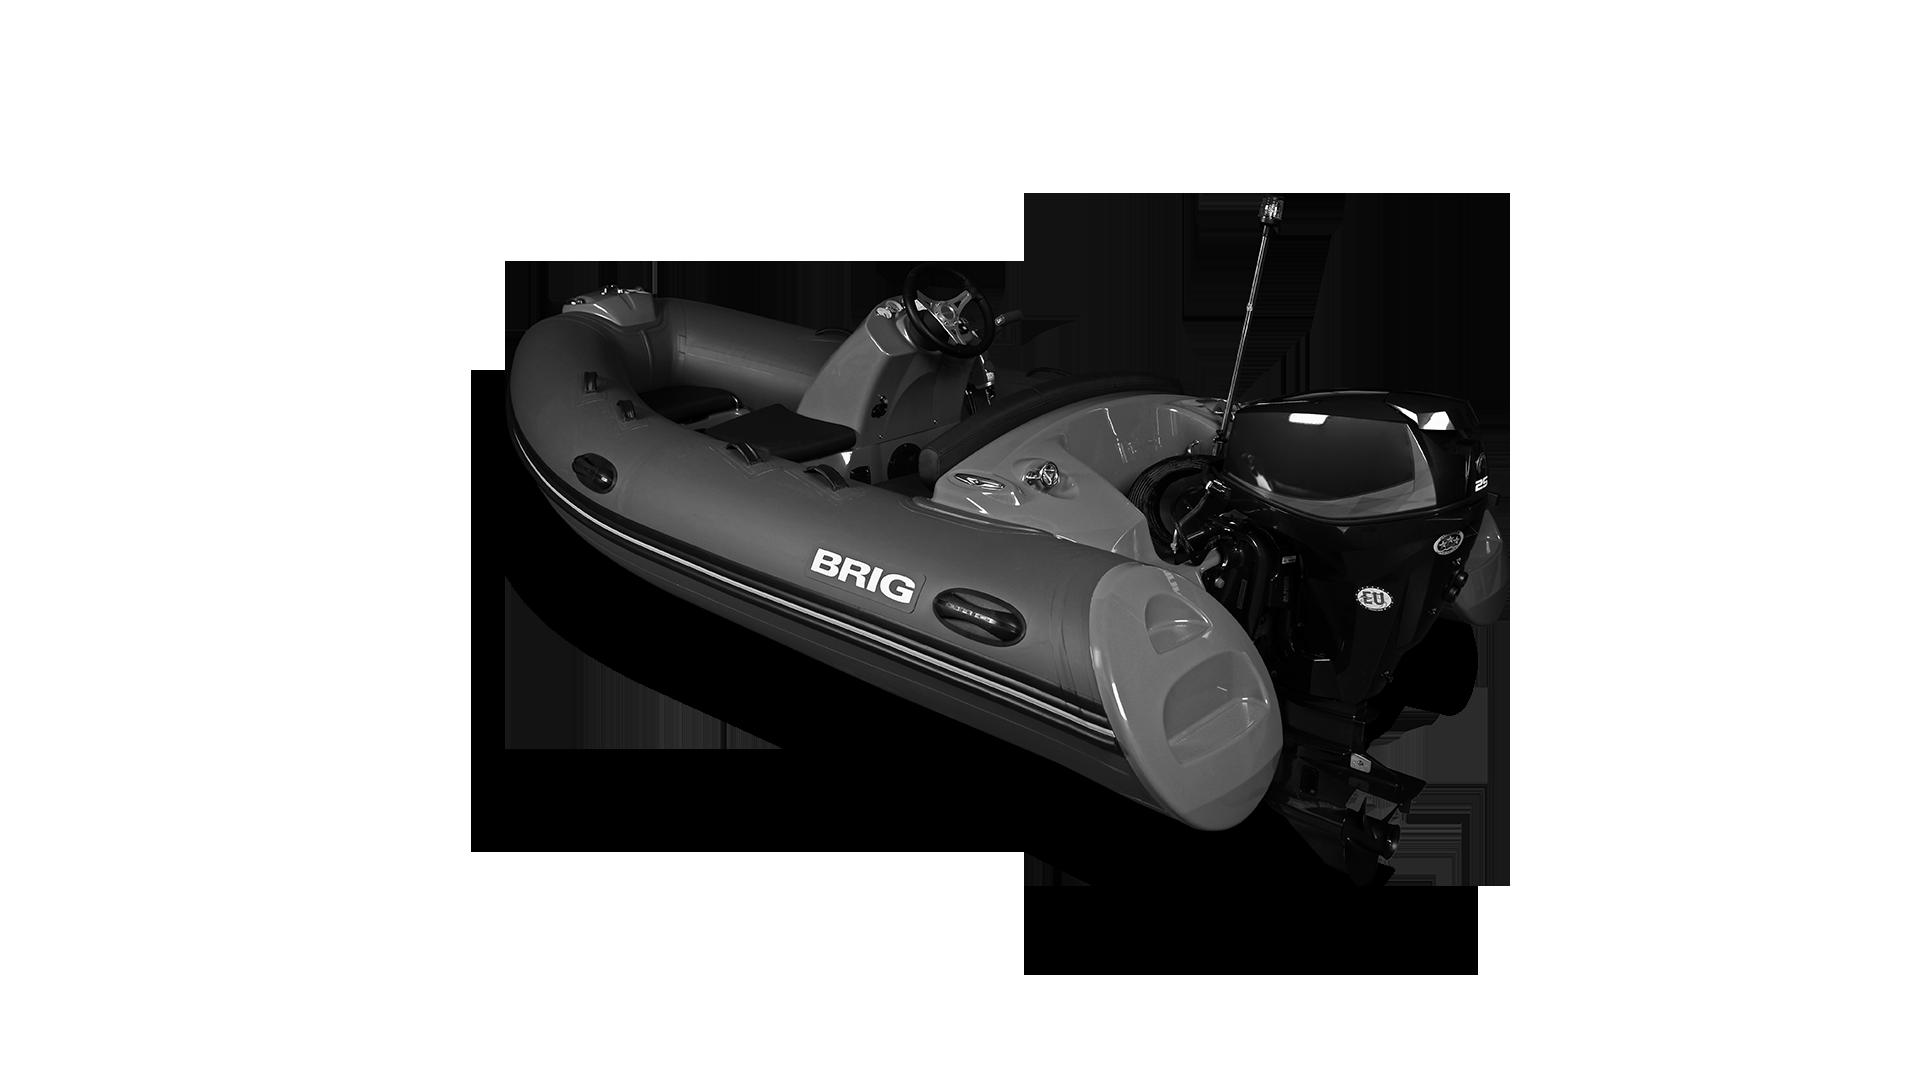 Eagle 340 Rigid Inflatable Boat